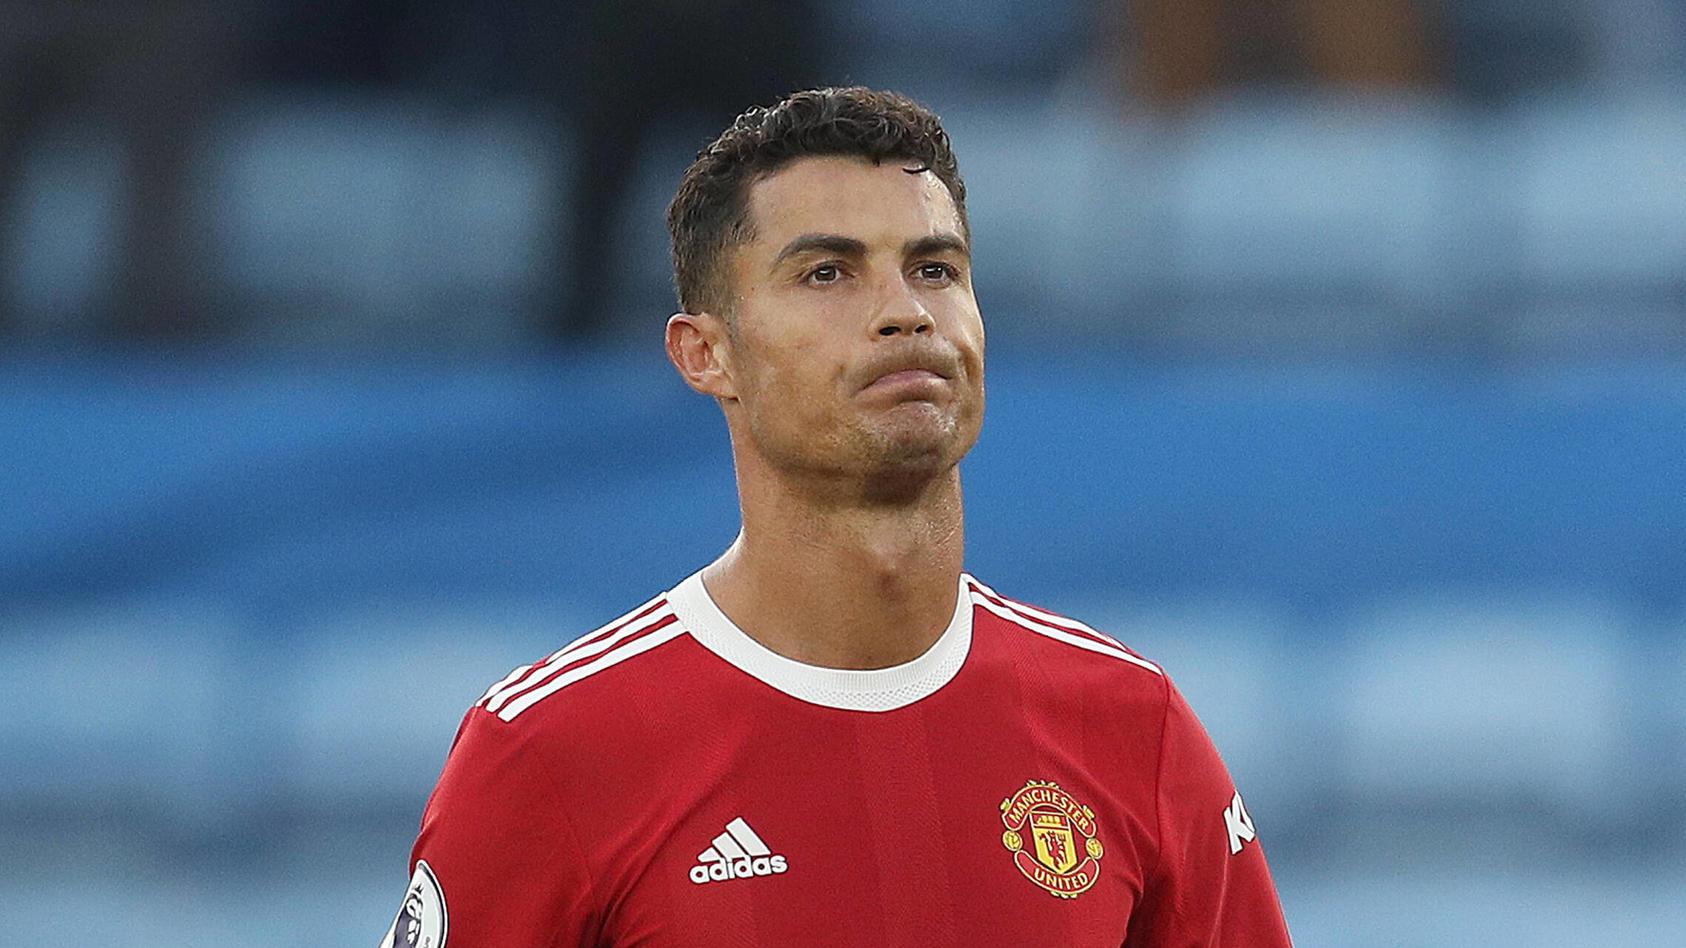 Mega-Demütigung für Man United - Ronaldo verliert komplett den Verstand